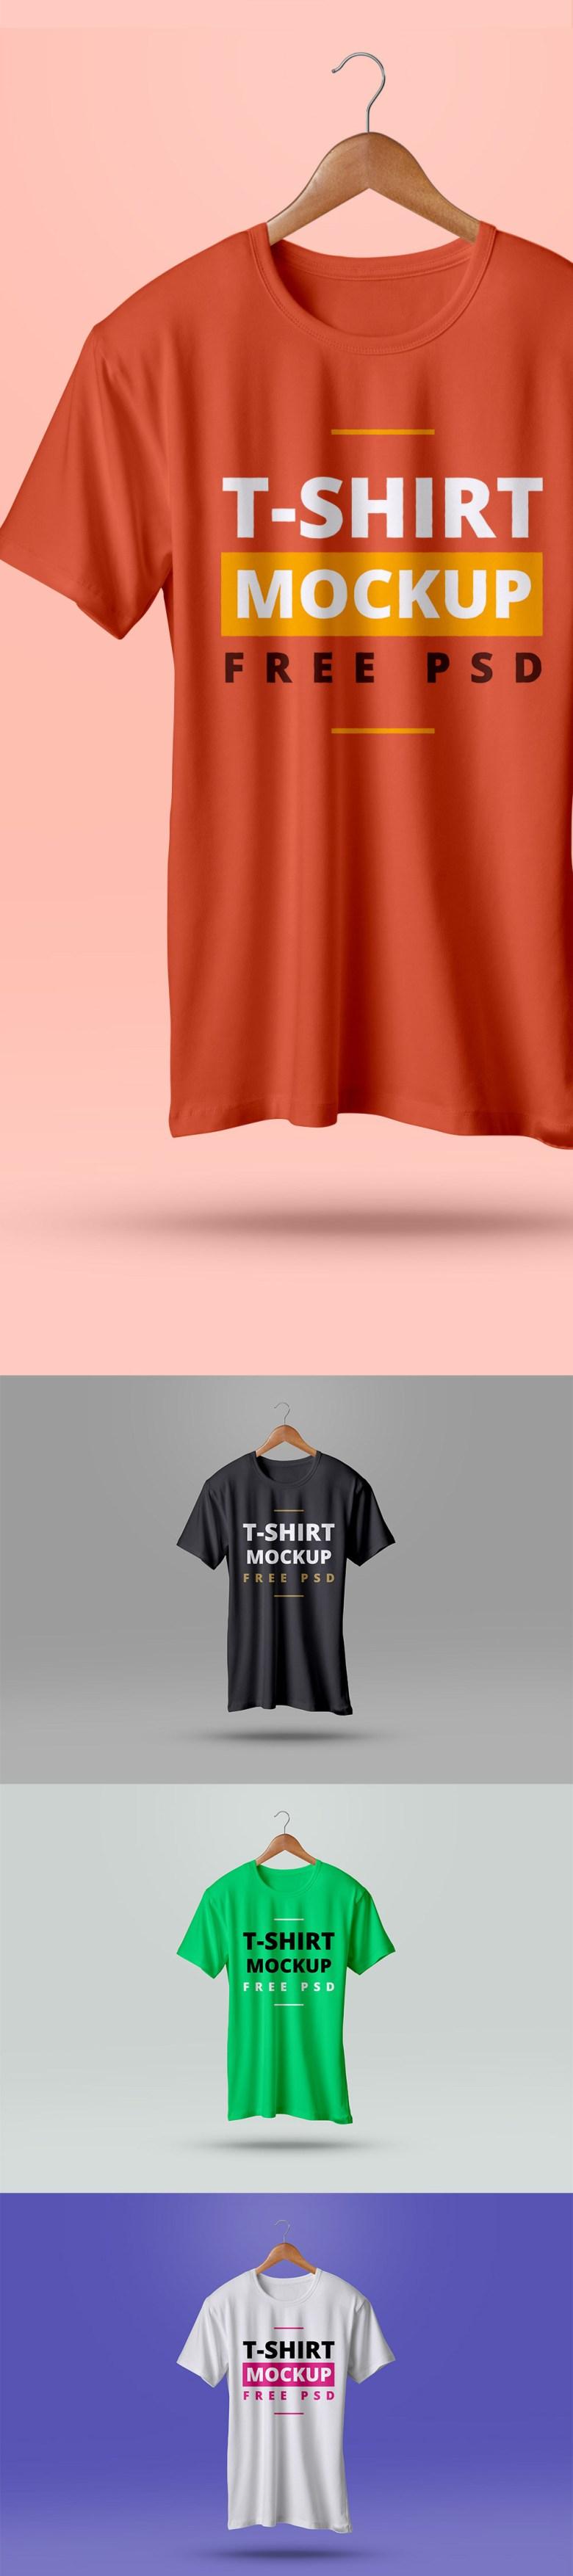 Free-T-Shirt-Mockup-PSD